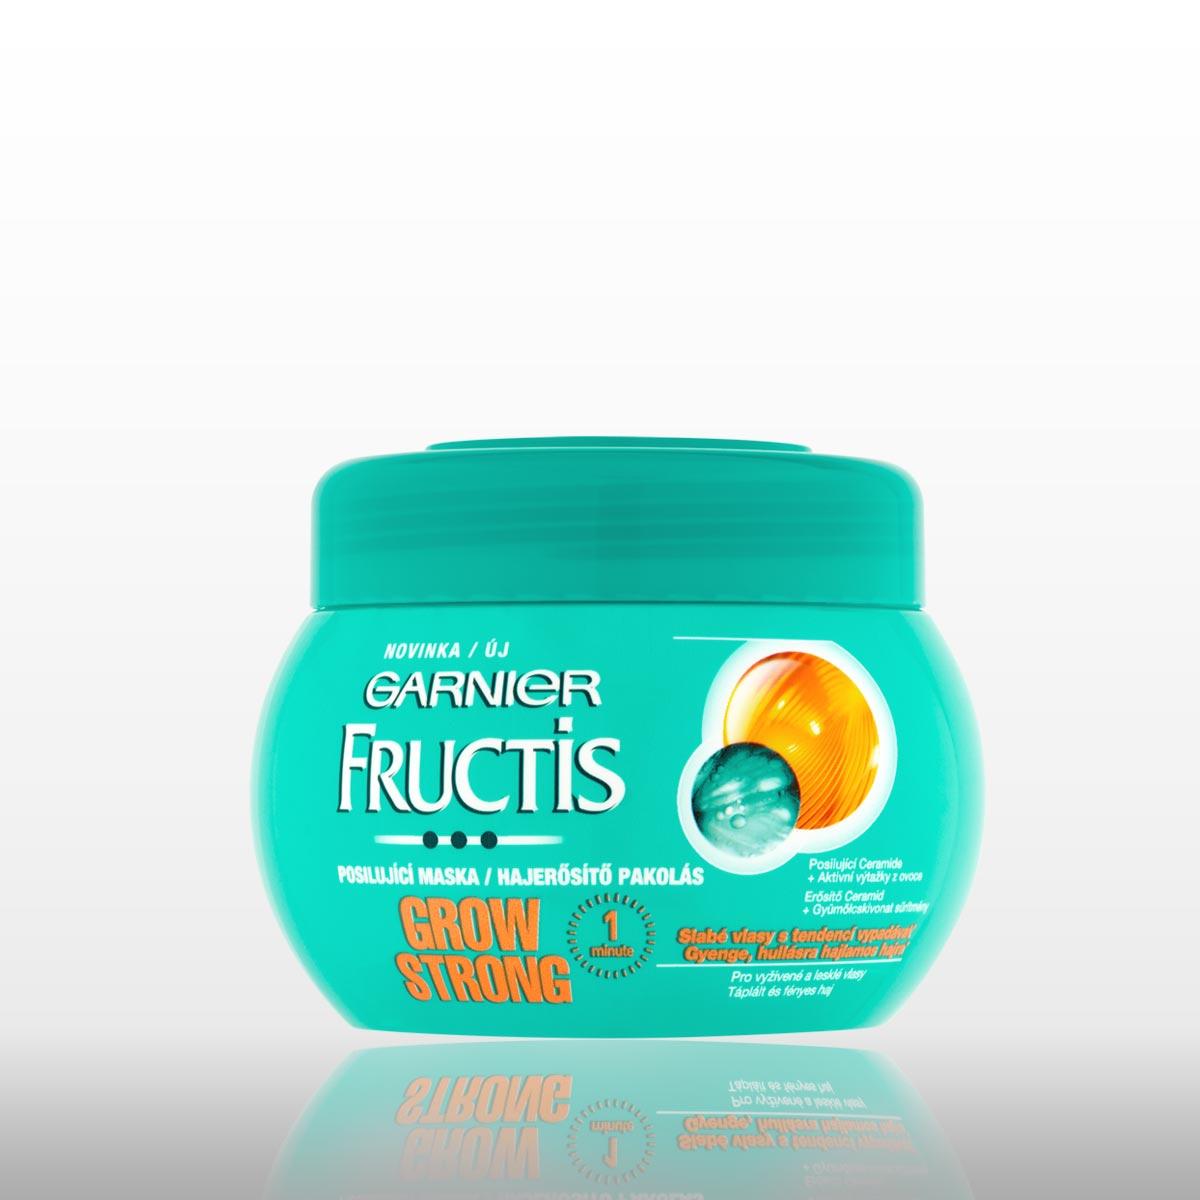 Maska Garnier Fructis Grow Strong pre slabé vlasy.